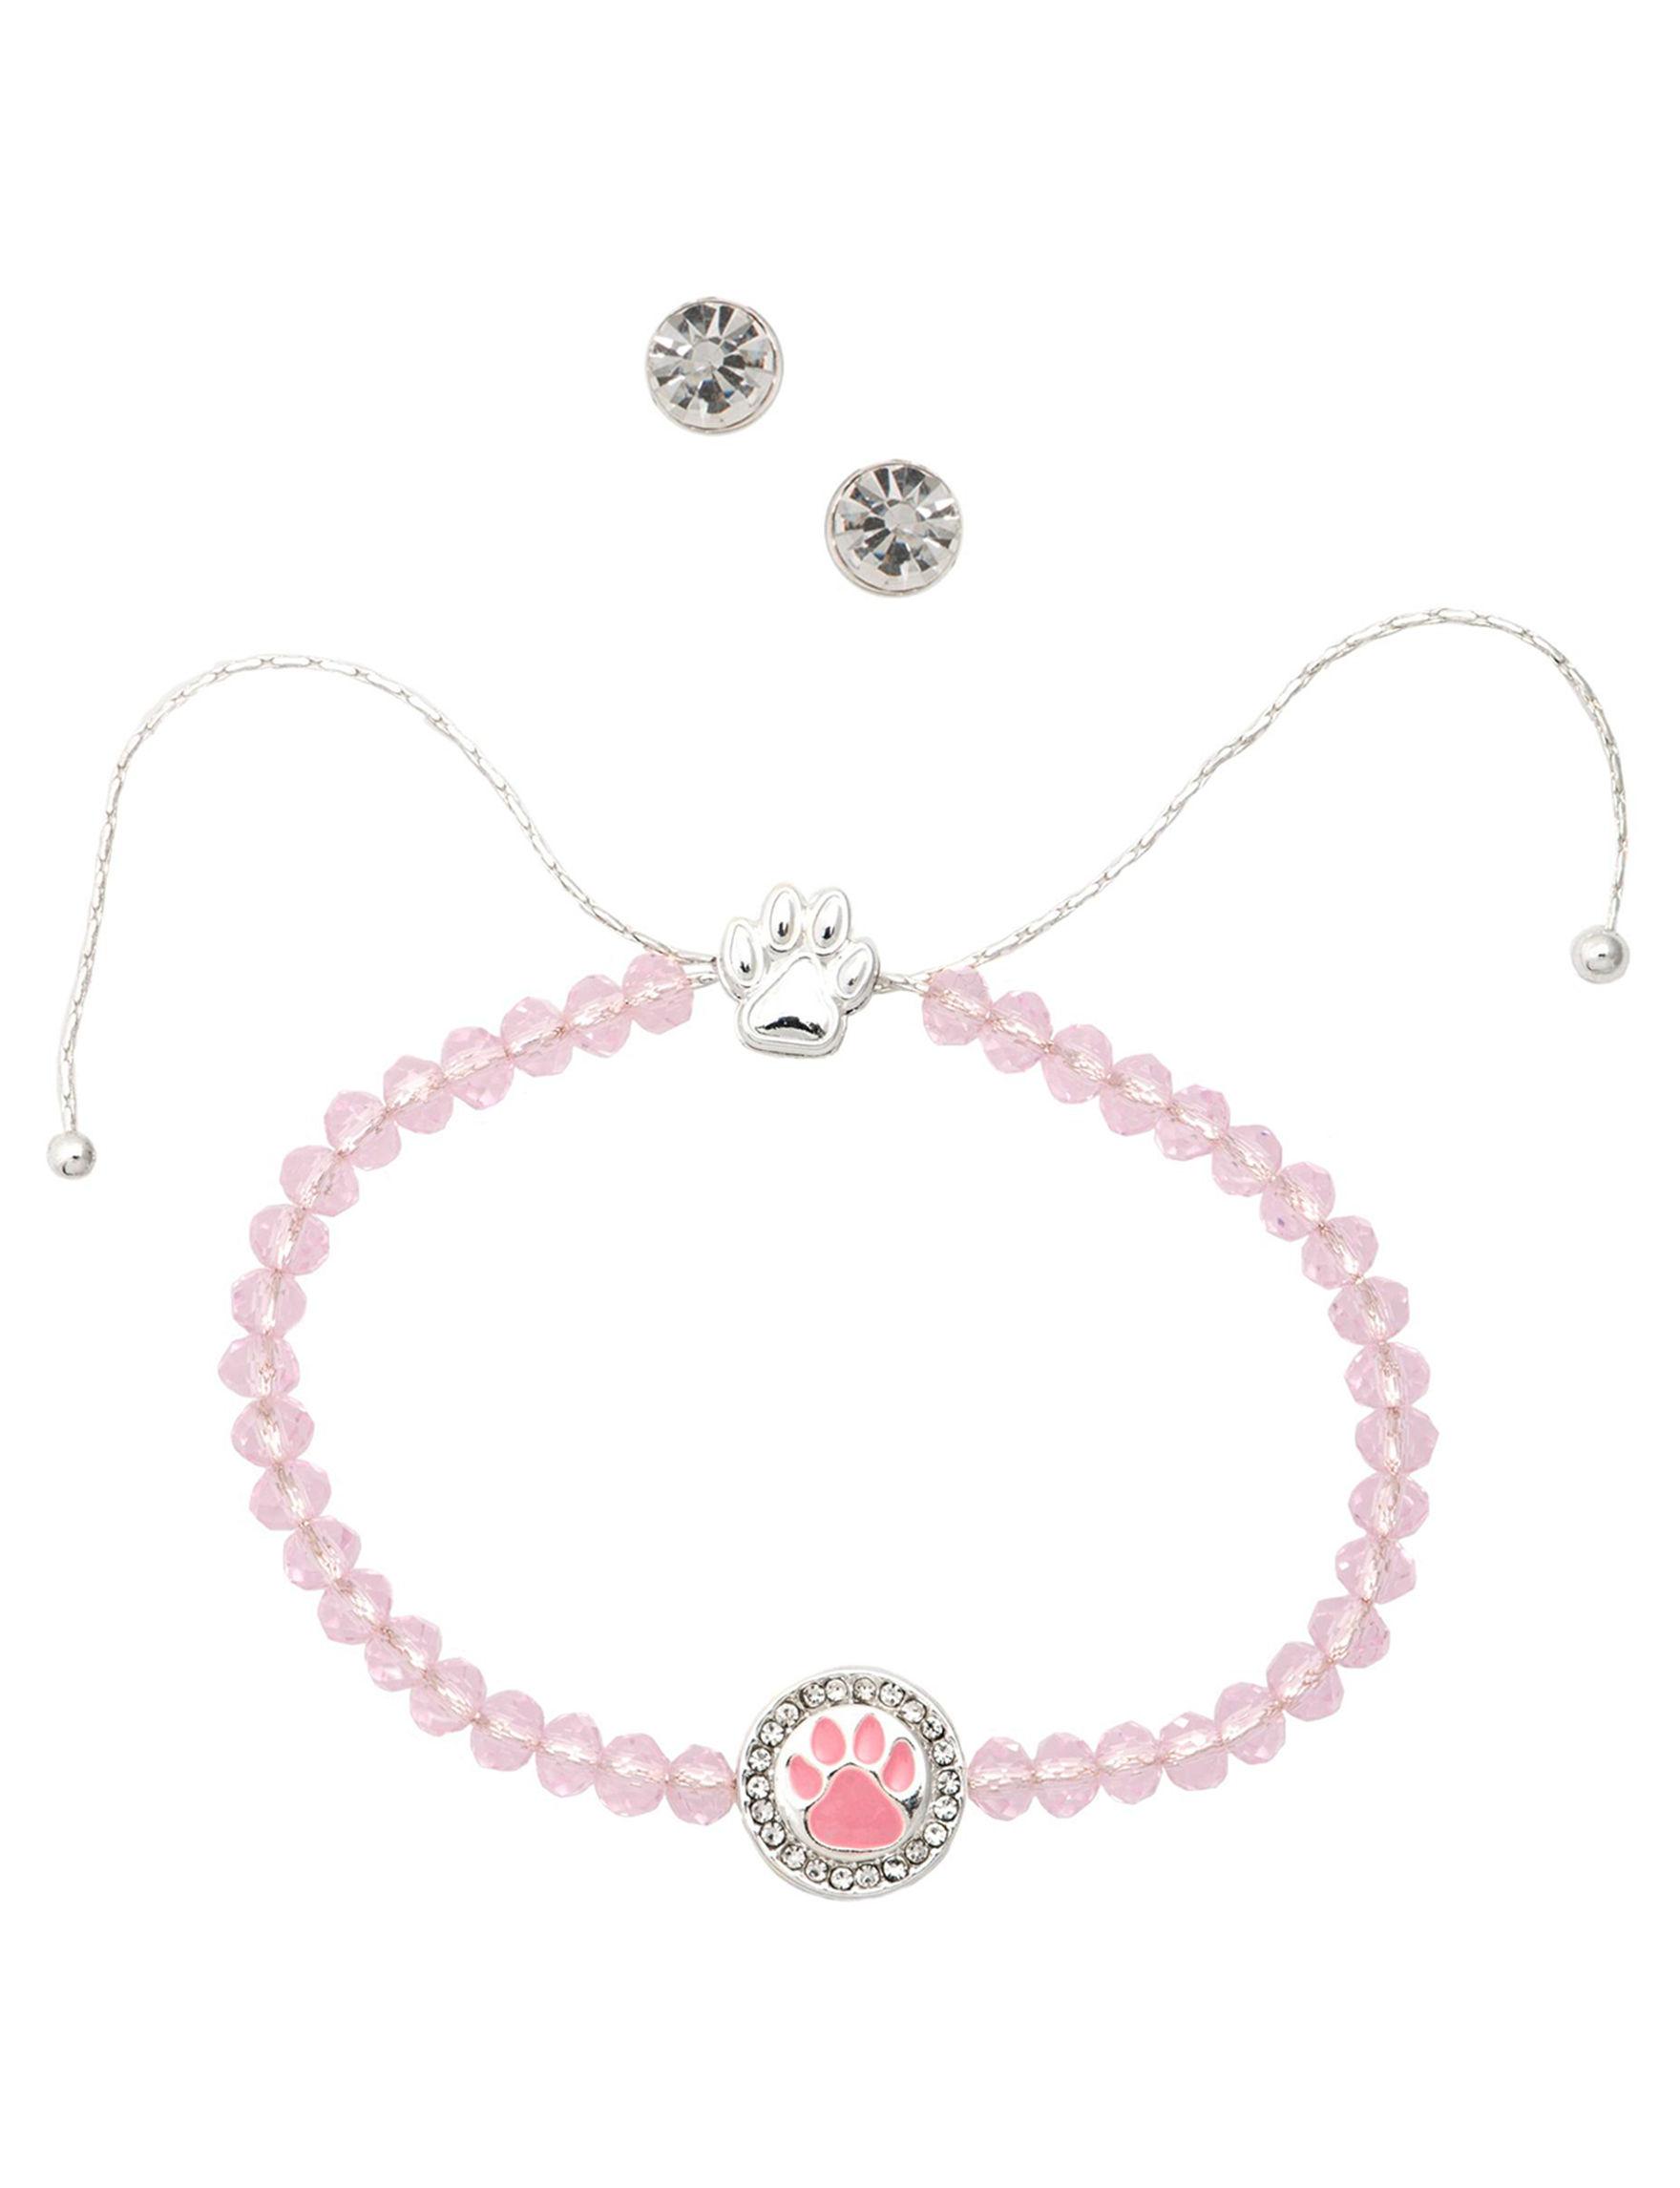 Pet Friends Silver / Pink Jewelry Sets Fashion Jewelry